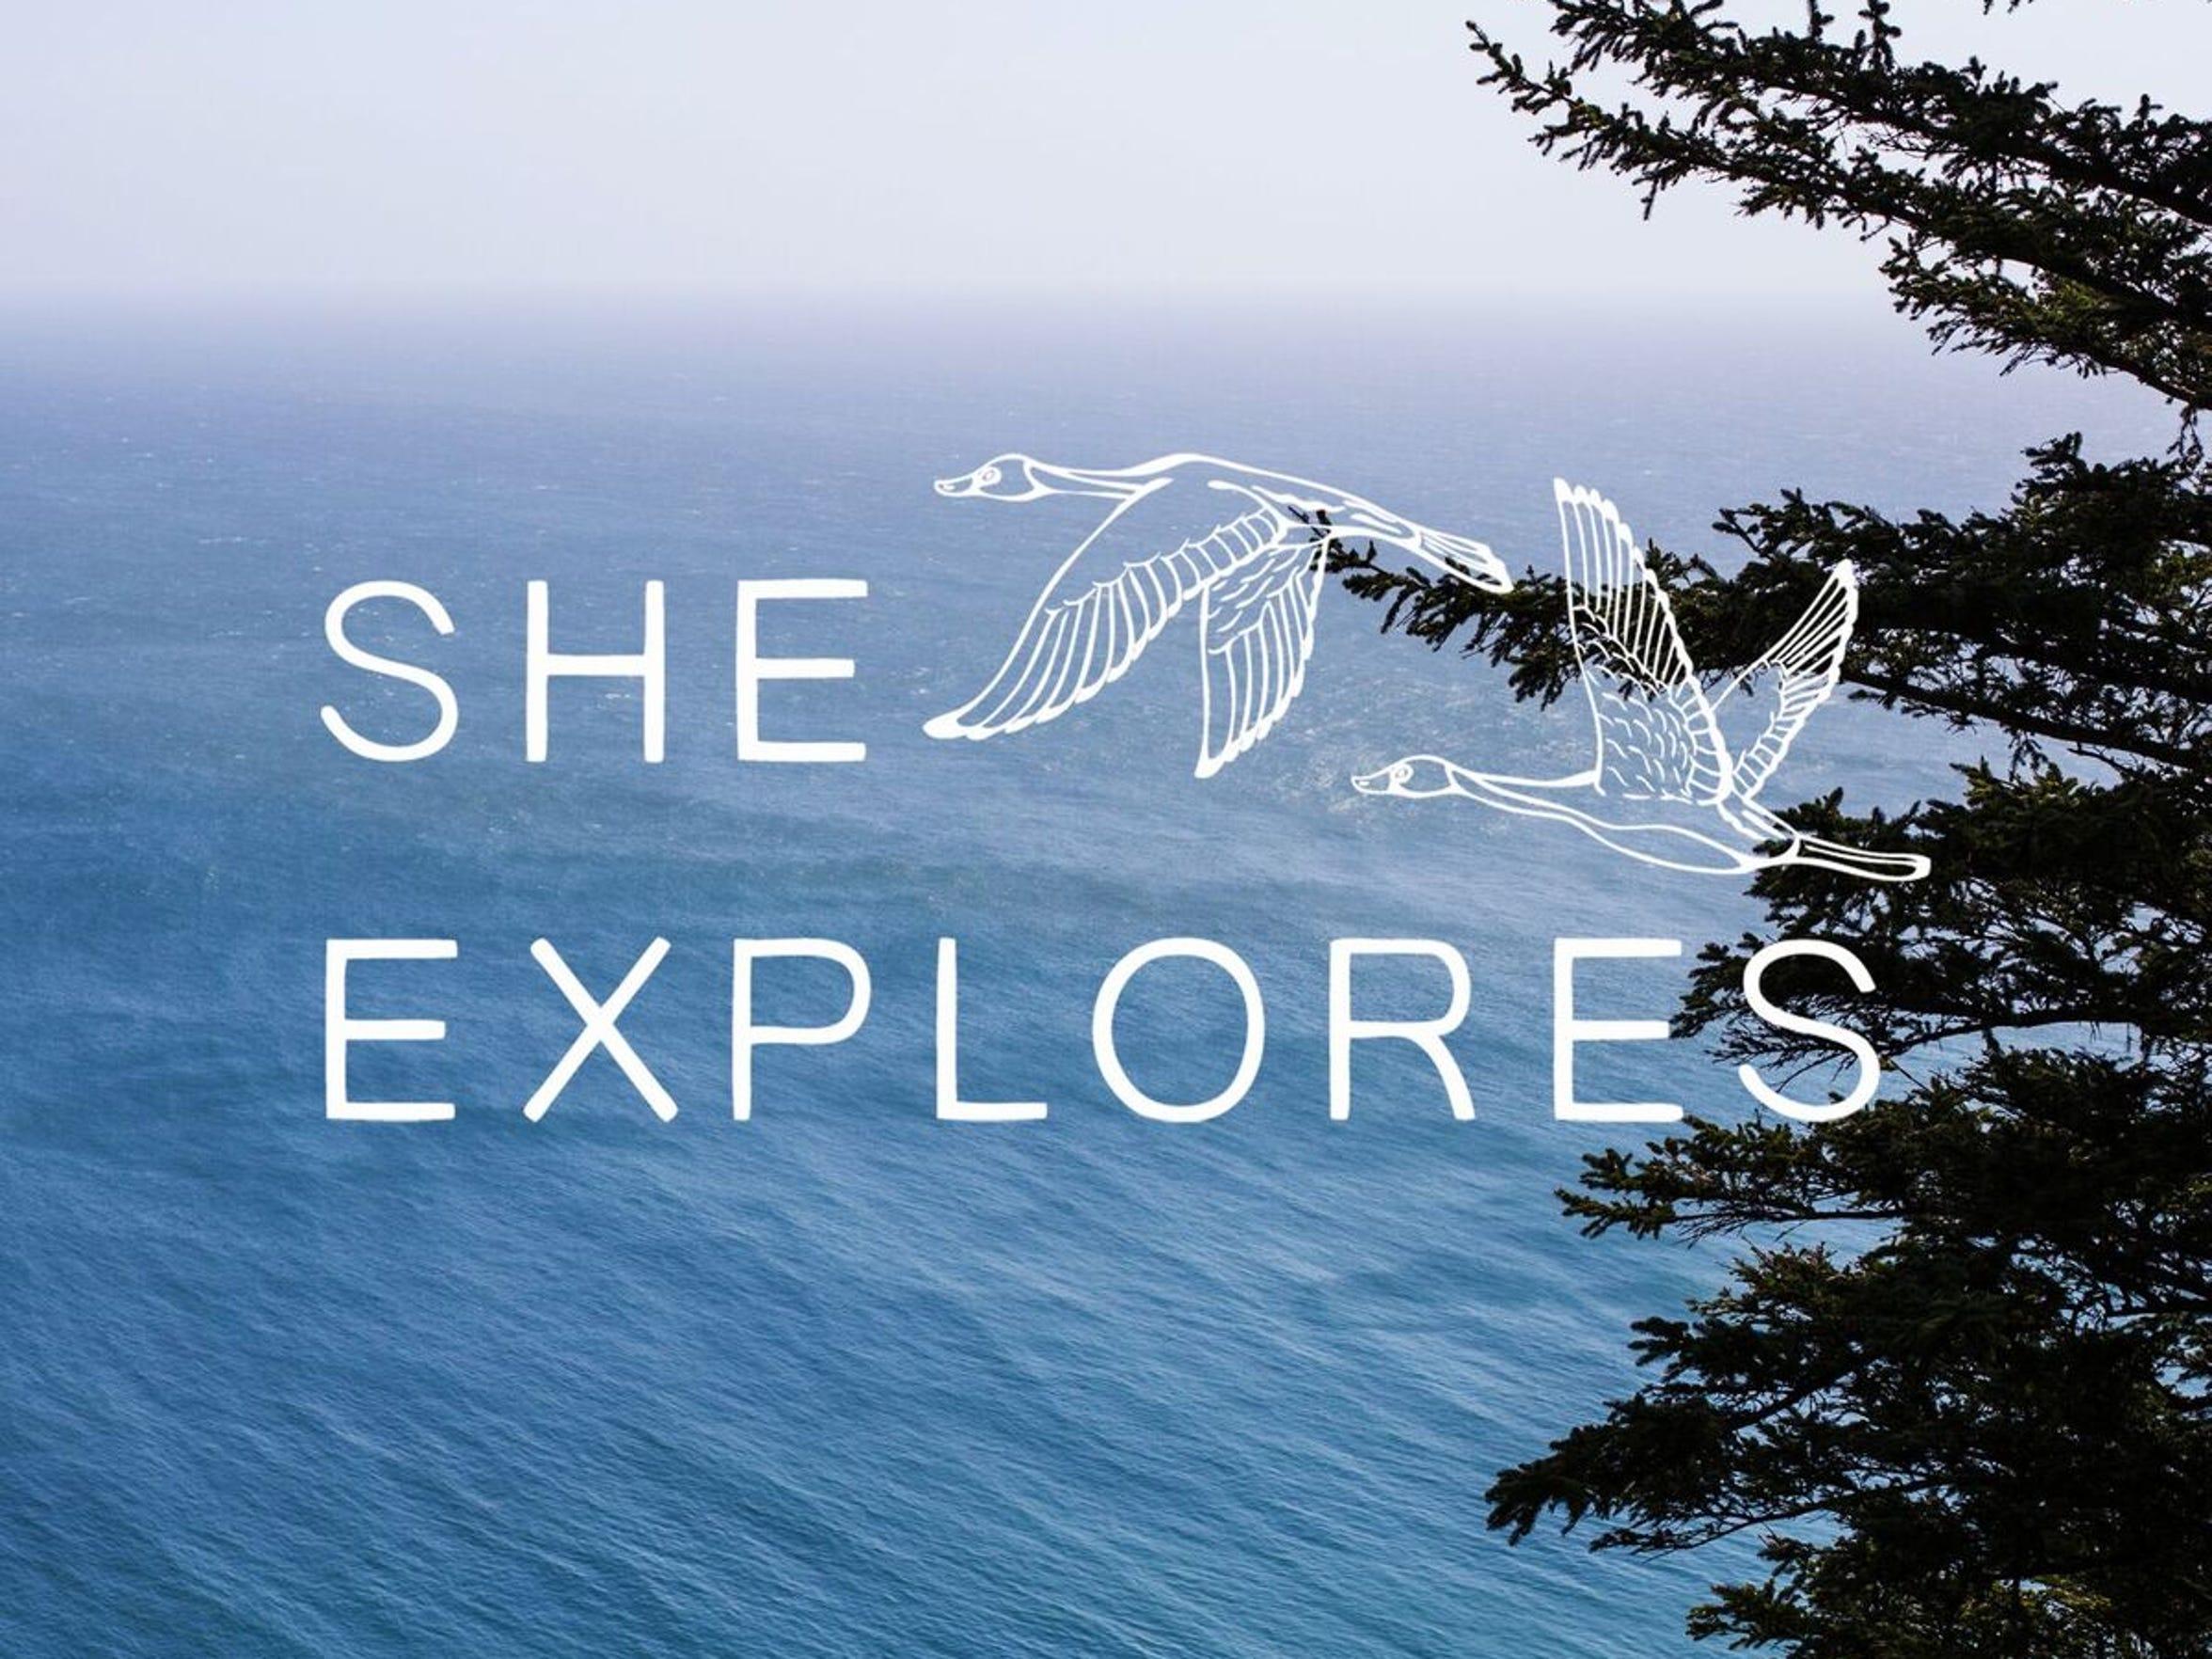 She Explores began as a website and evolved into a podcast for female explore adventurers.